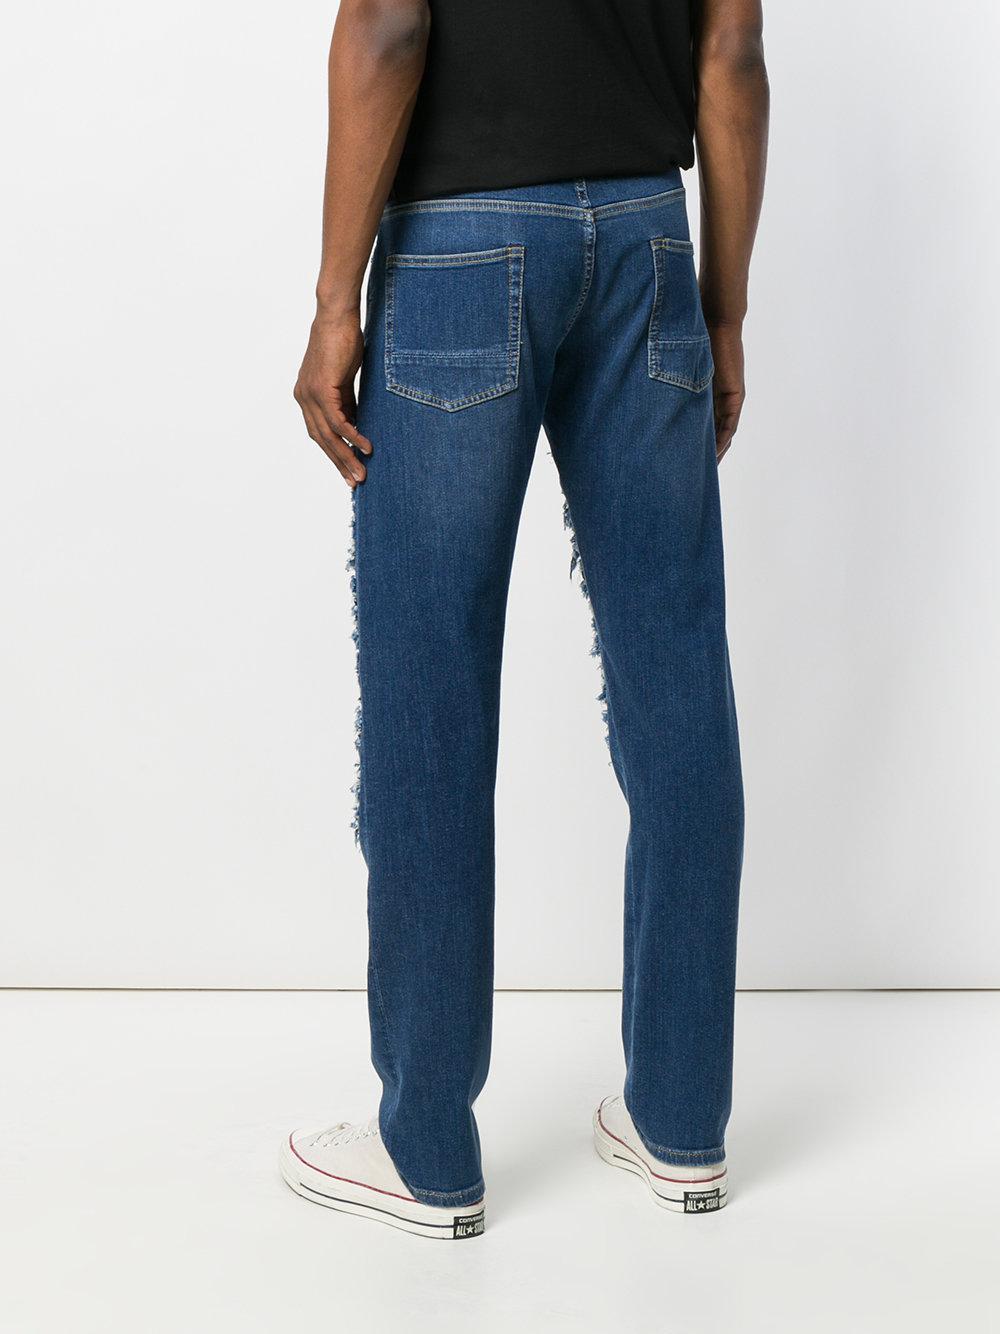 Jeans Coupe Droite - Bleu Alexander Mcqueen yc1q3e